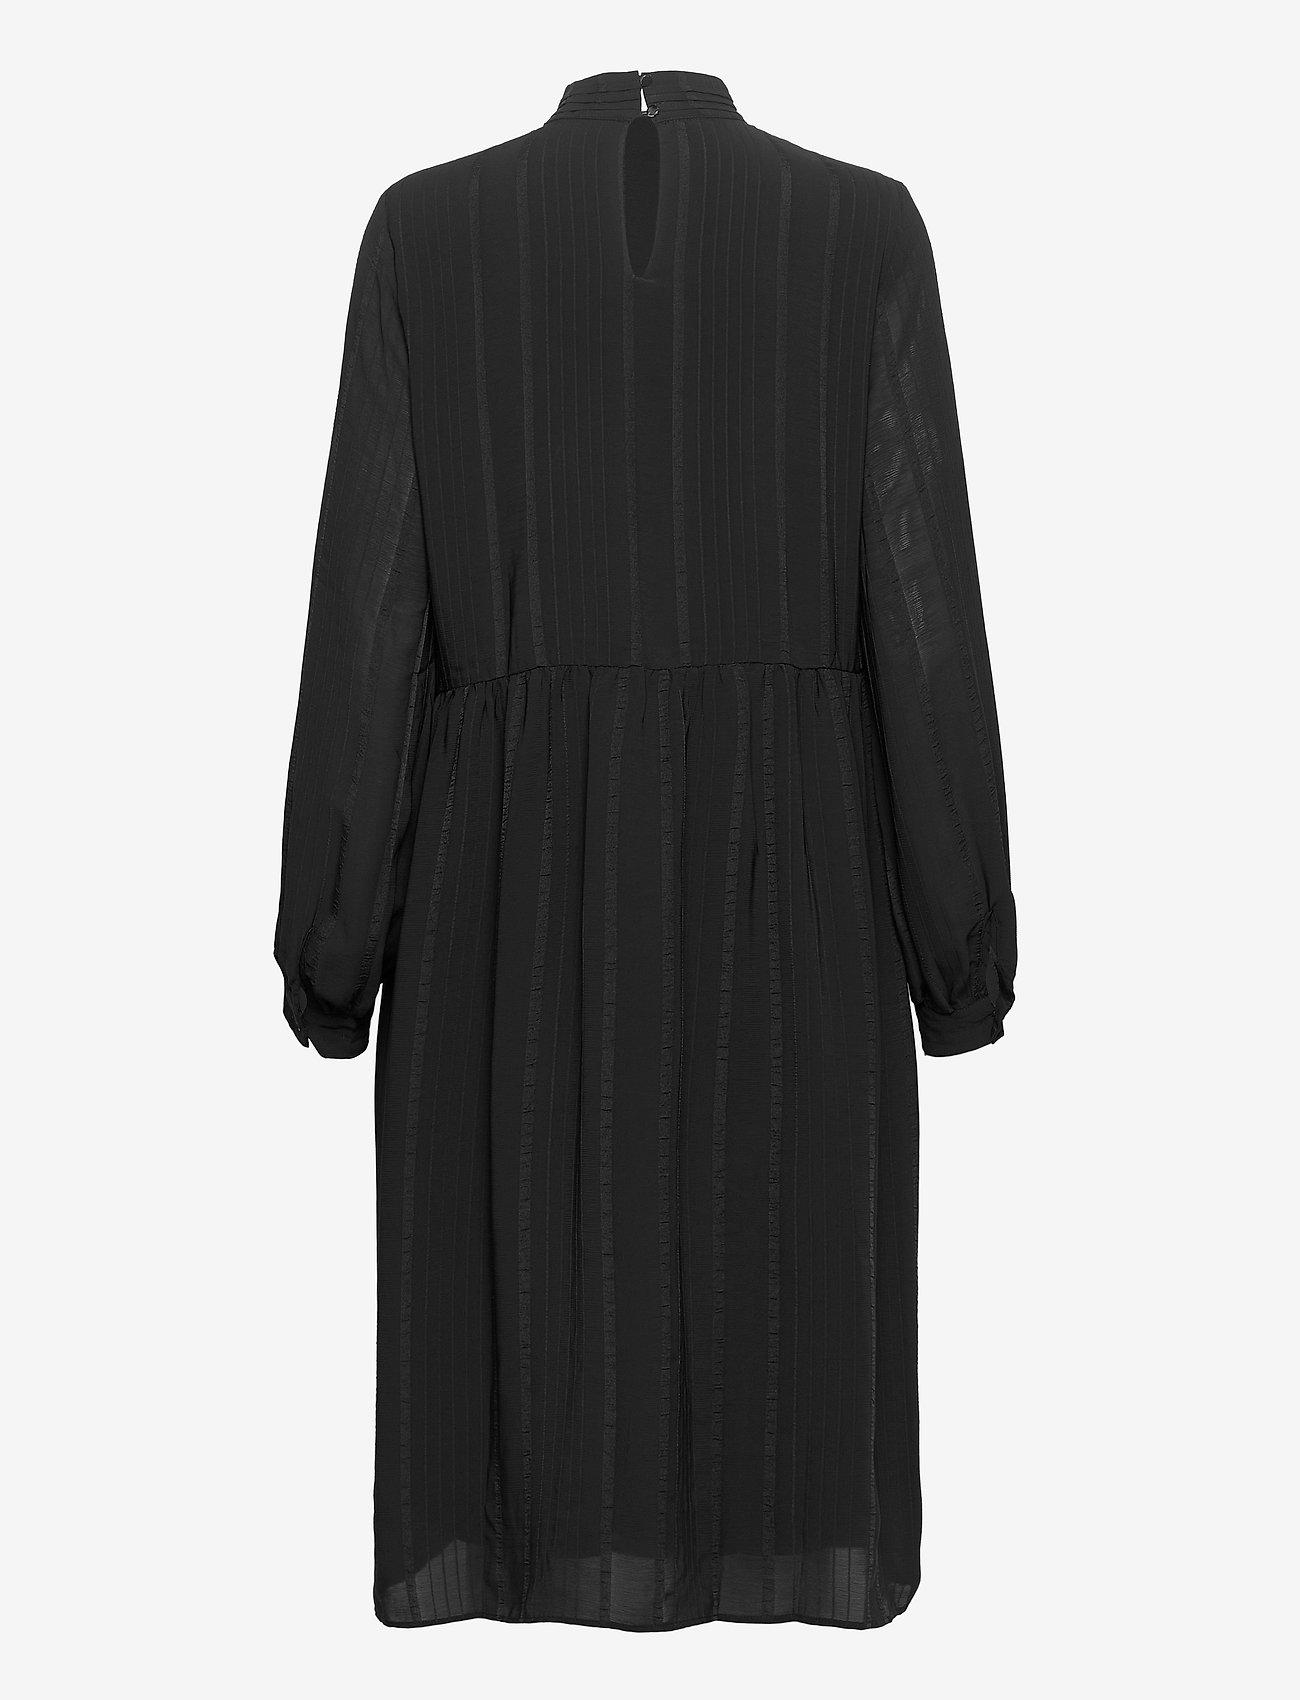 Fransa - FRMASTRI 1 Dress - midi jurken - black - 1